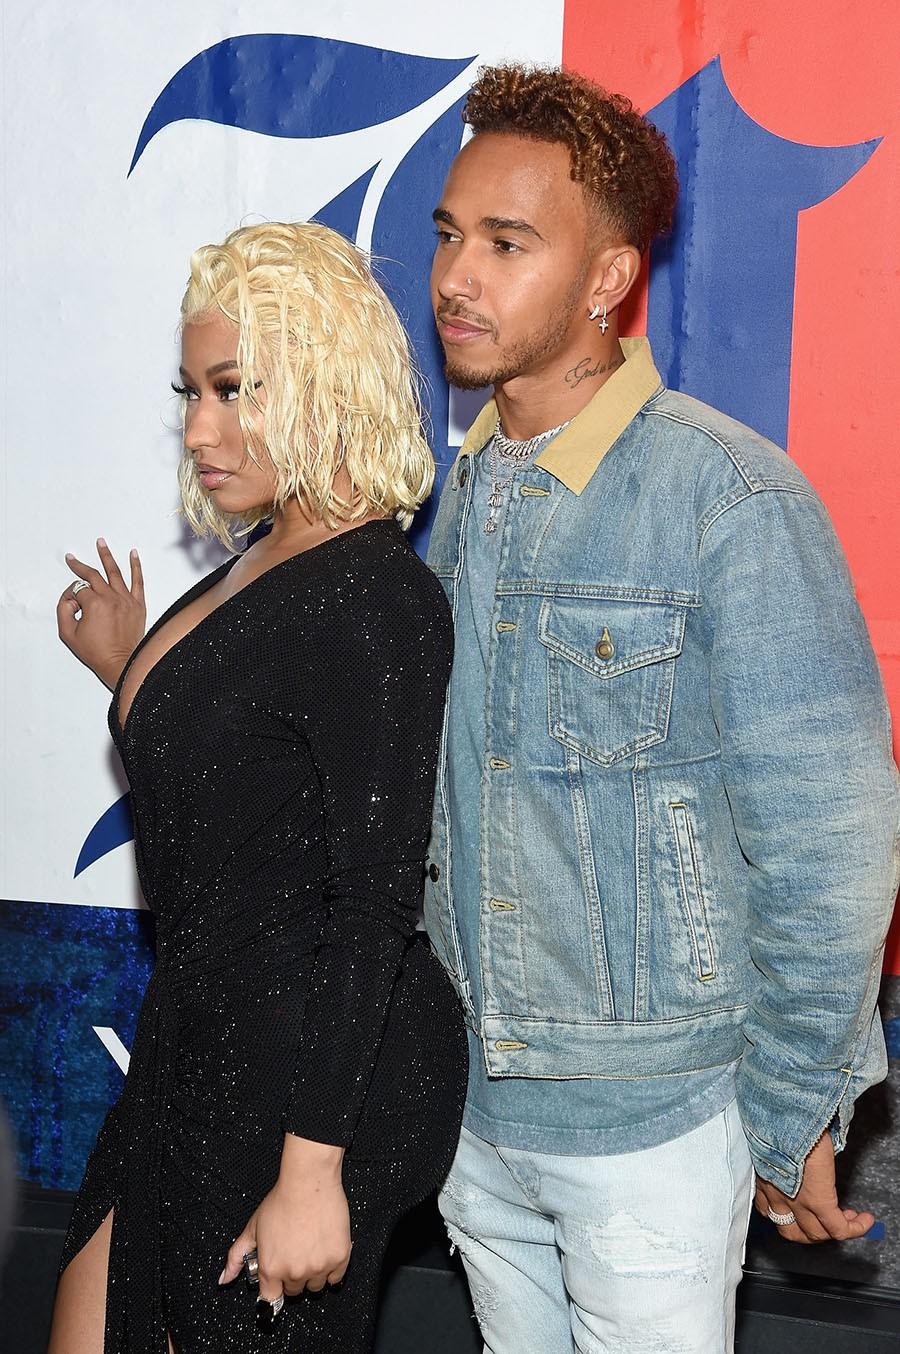 Nicki Minaj & Lewis Hamilton spark dating rumours with night out in NYC (photos)